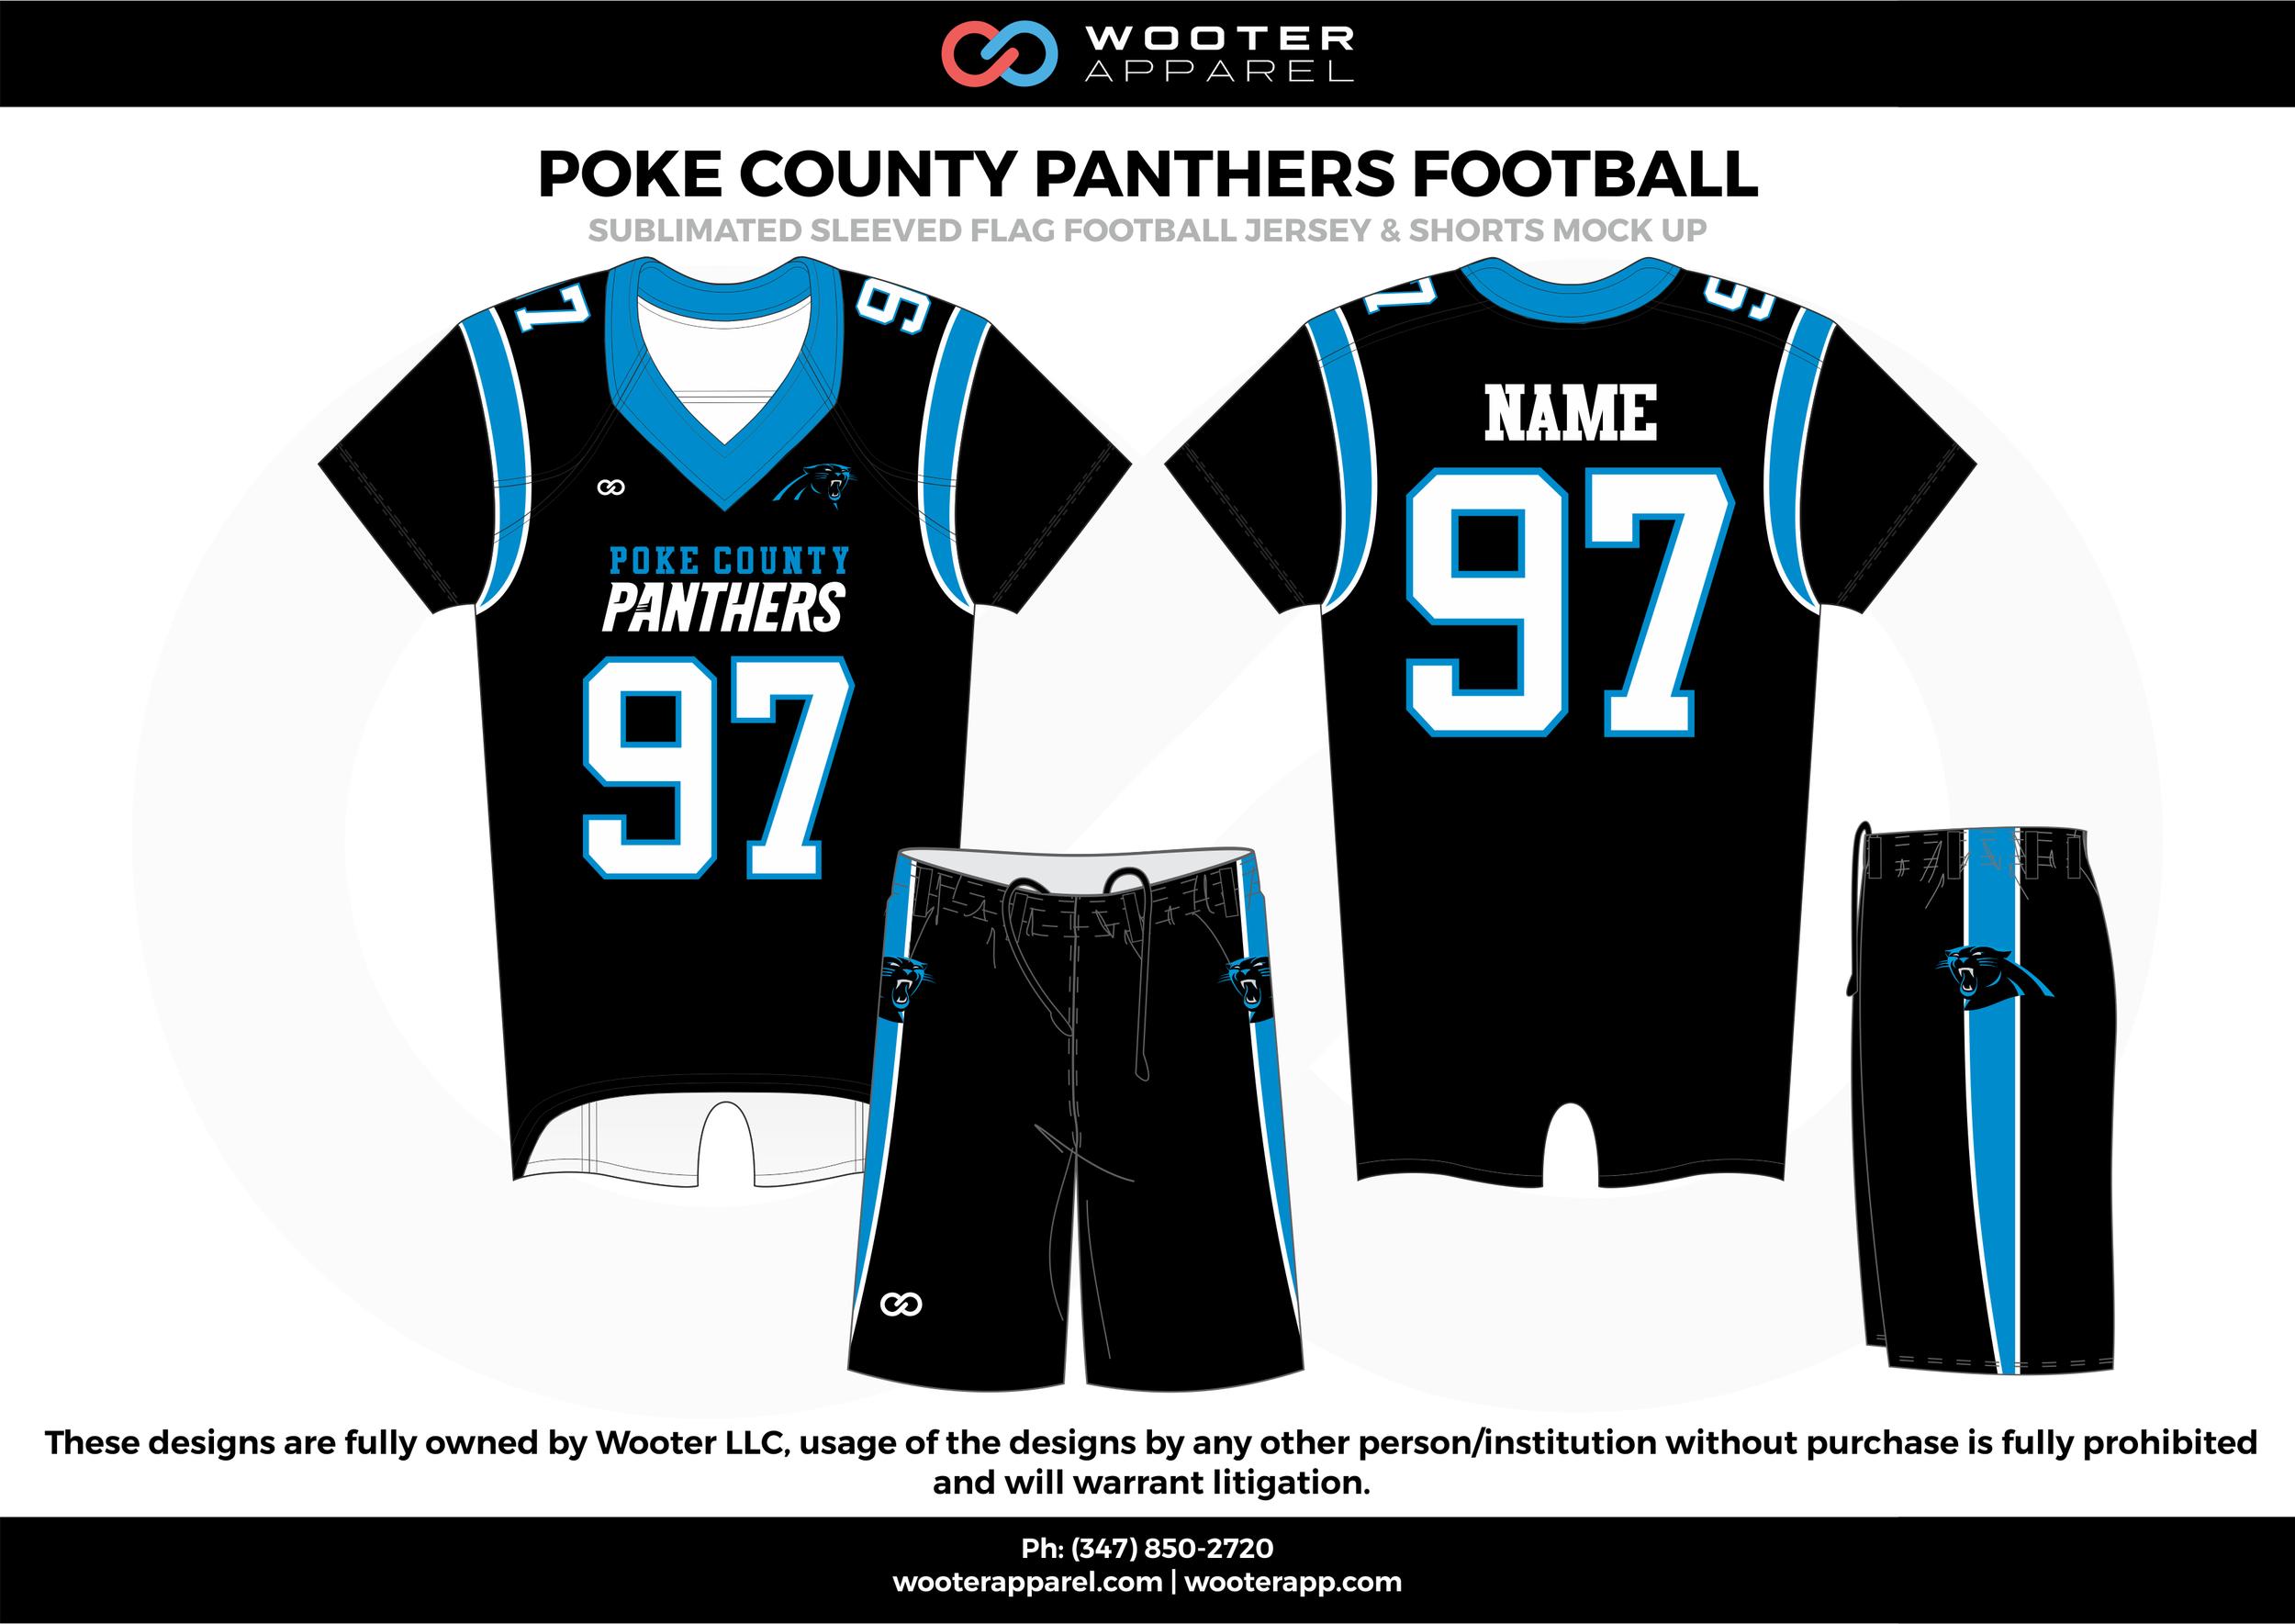 POKE COUNTY PANTHERS FOOTBALL black blue white flag football uniforms jerseys shorts